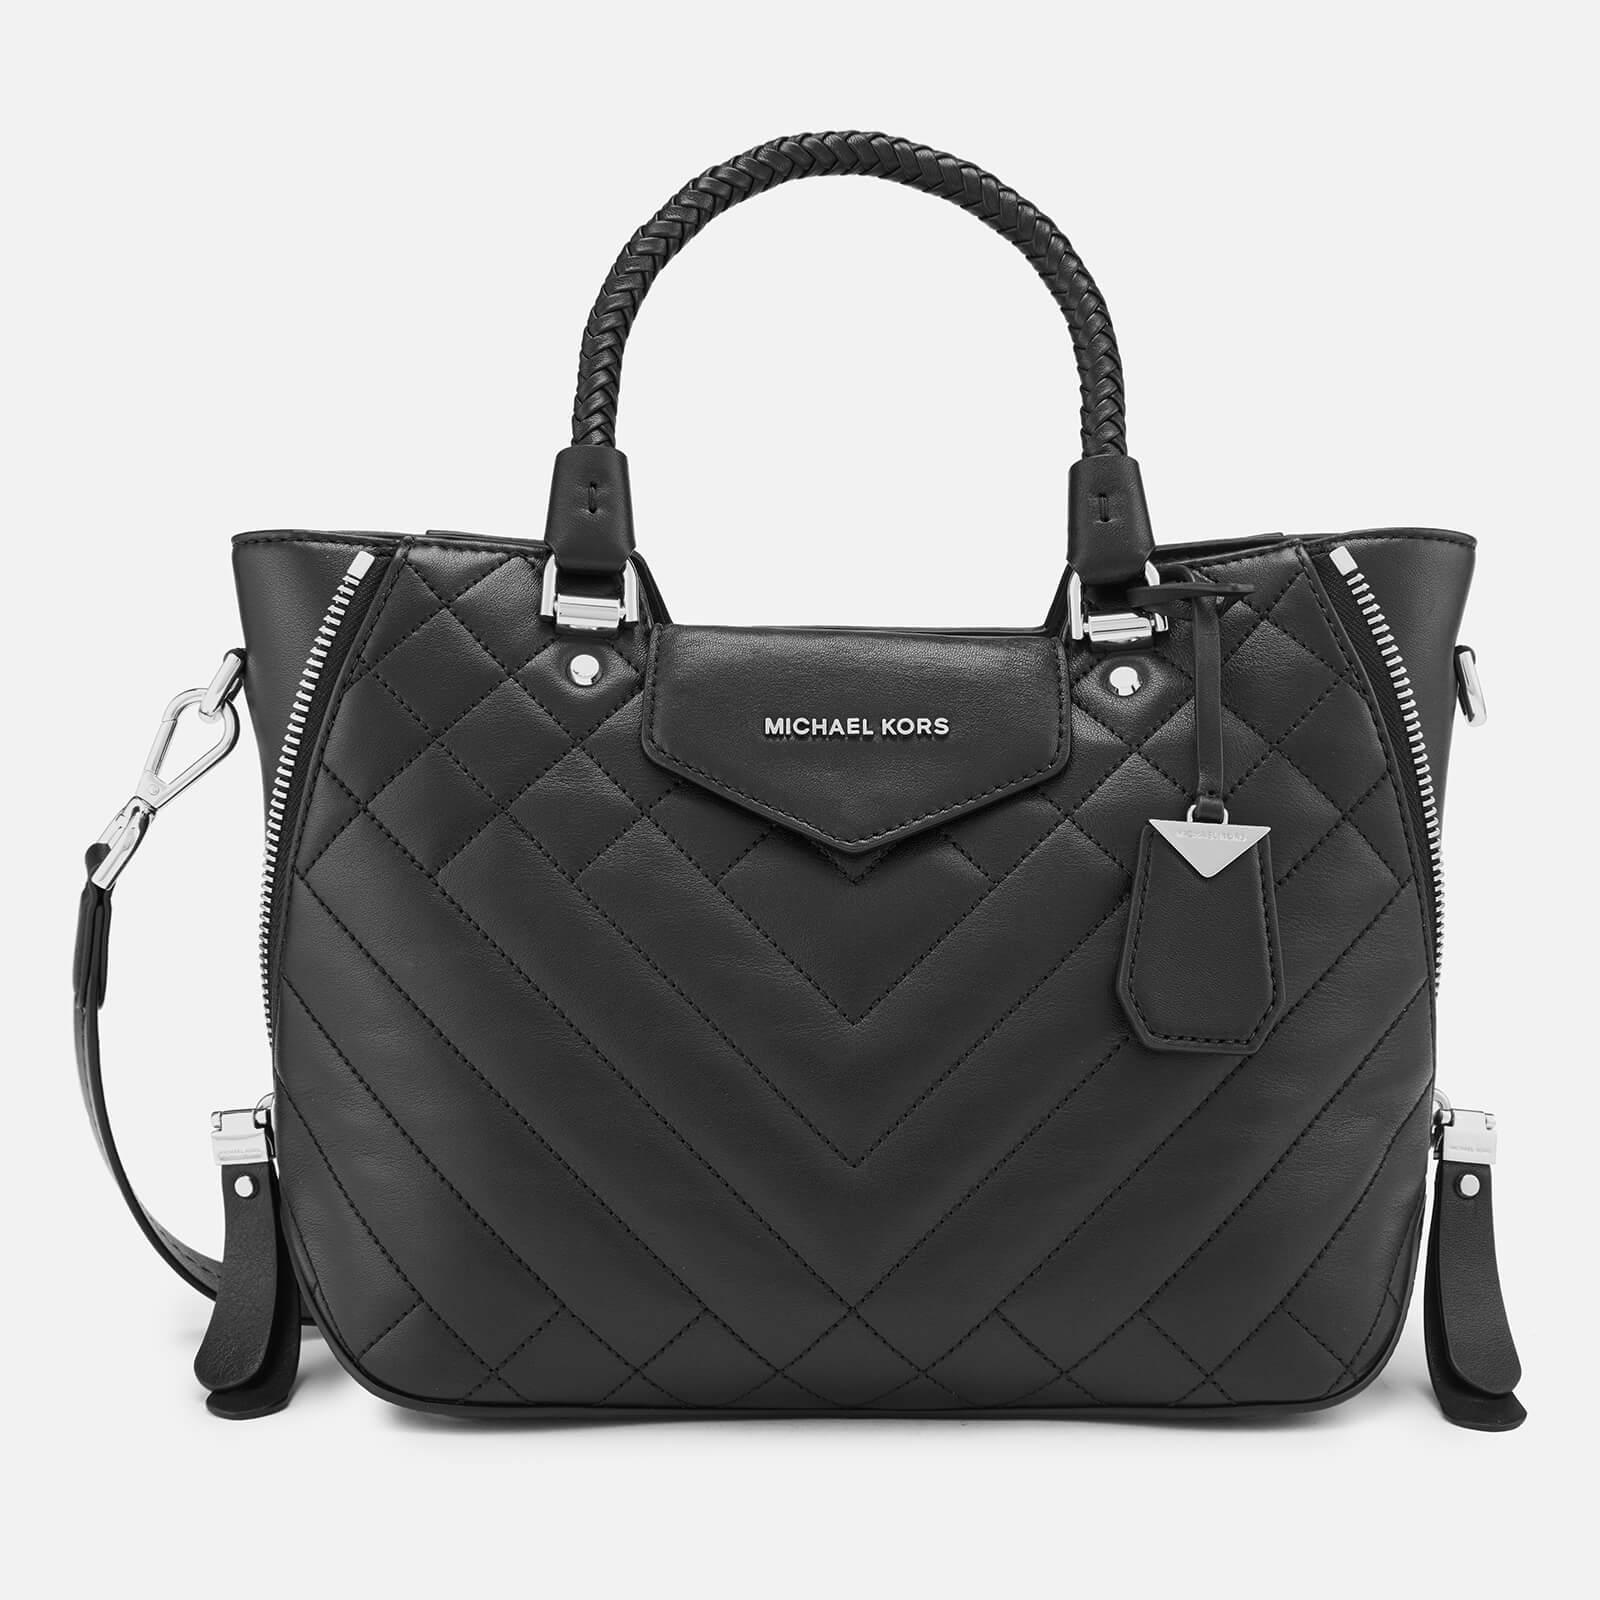 28cee3a98d4c51 MICHAEL MICHAEL KORS Women's Blakely Medium Messenger Bag - Black - Free UK  Delivery over £50